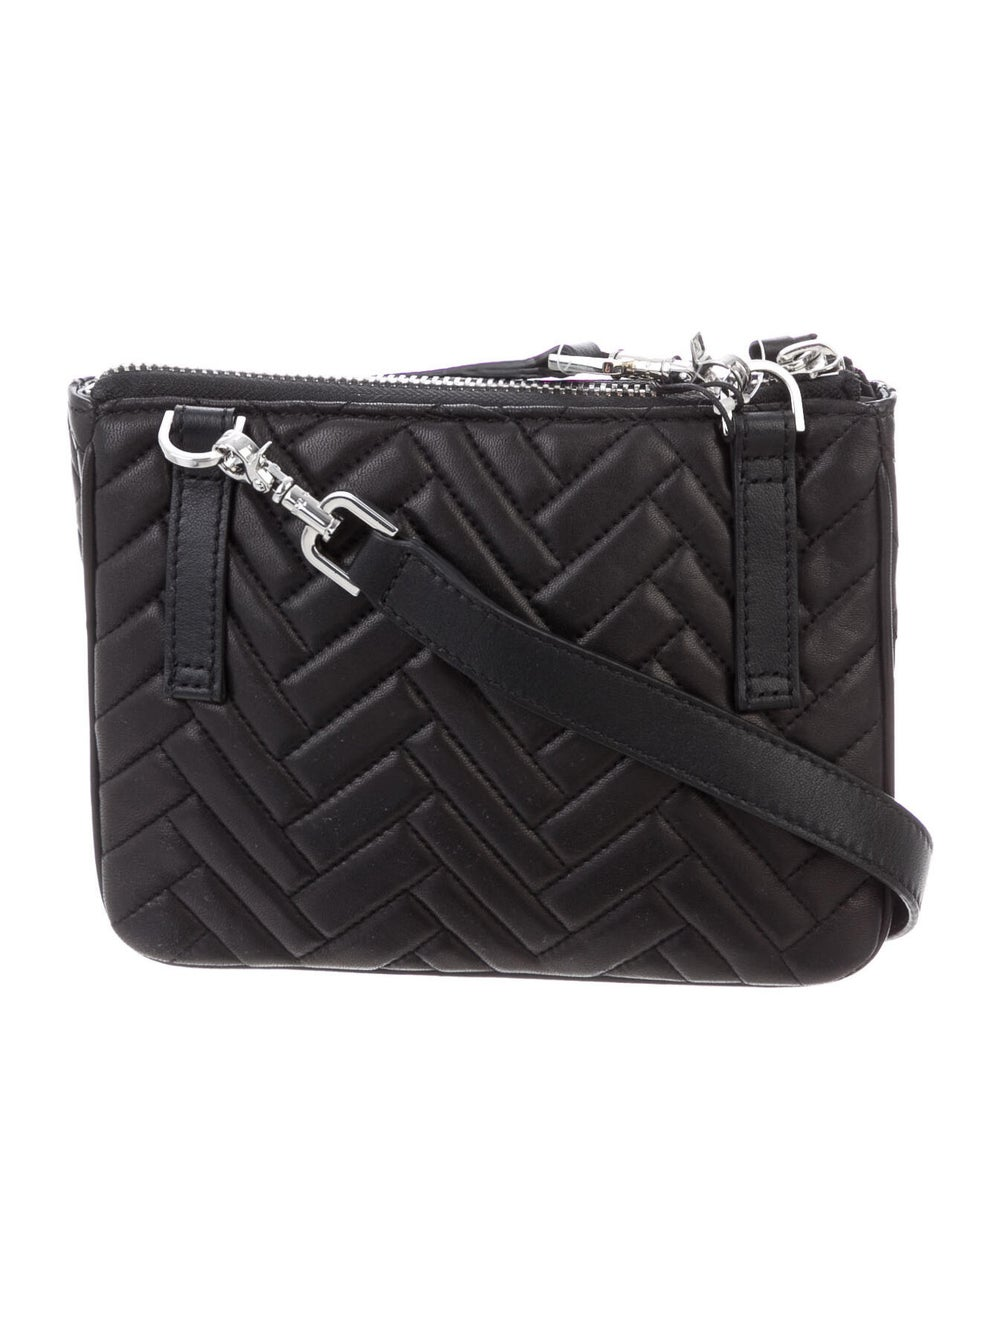 Mackage Leather Crossbody Bag Black - image 4